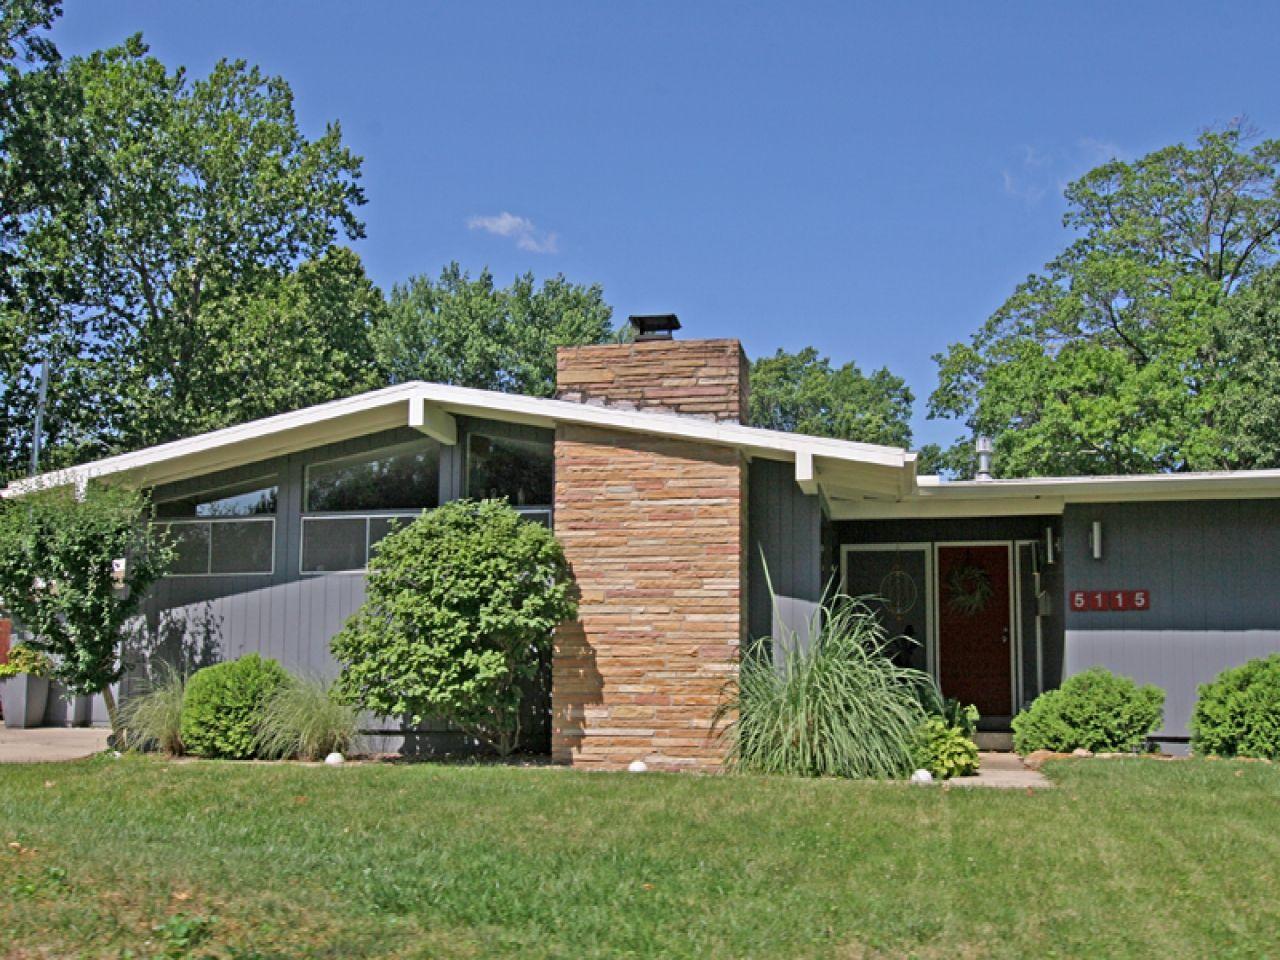 10 Gorgeous Ranch House Plans Ideas Mid Century Modern Exterior Modern Ranch Mid Century House